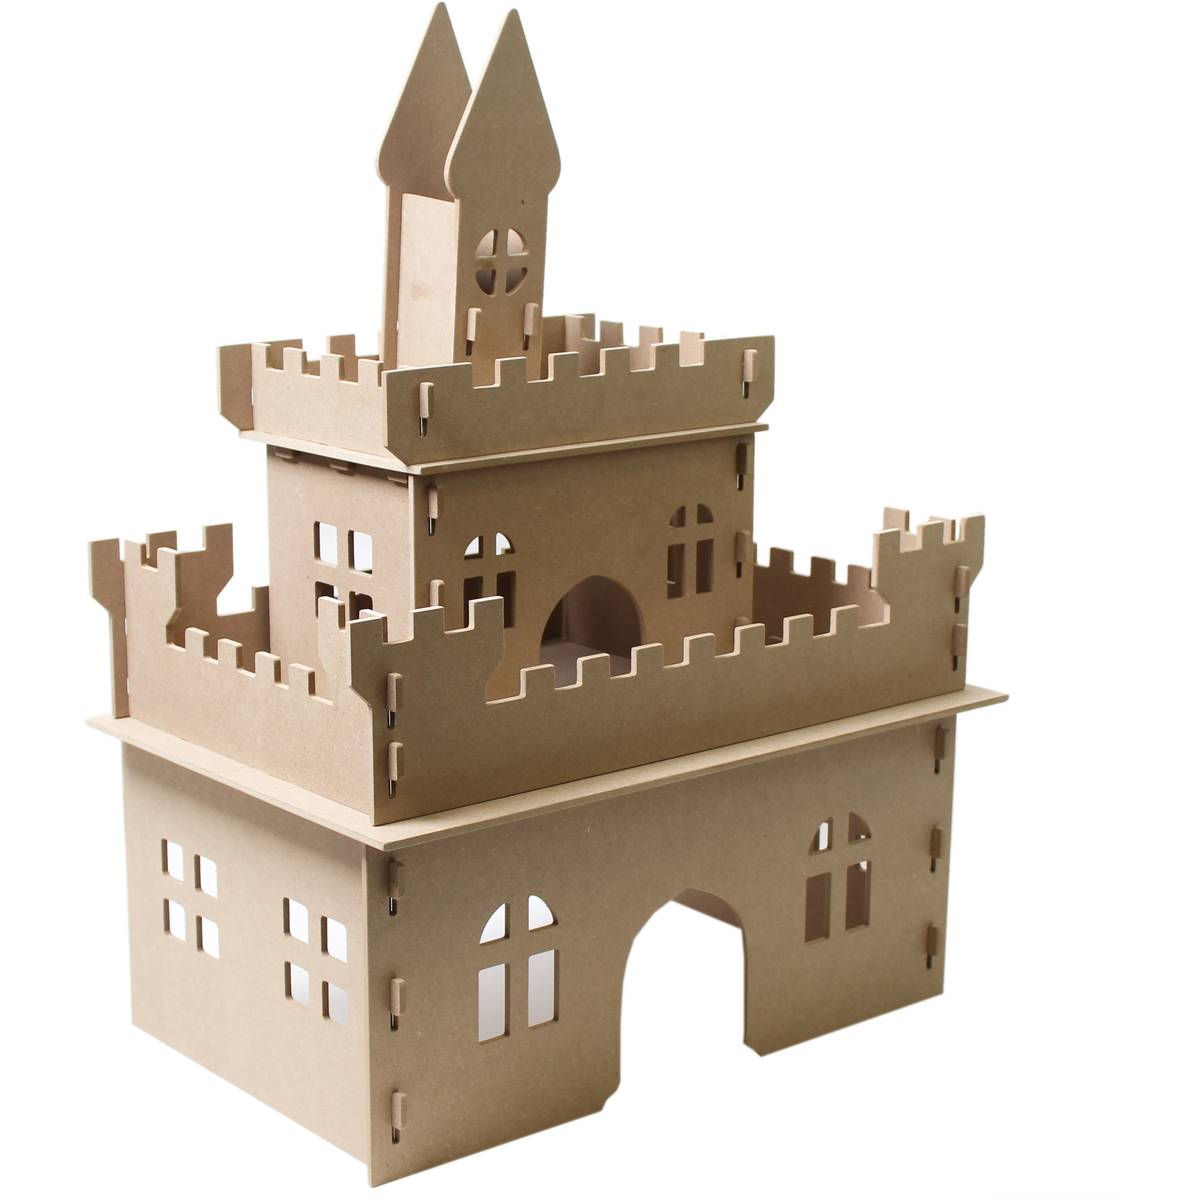 Decorate Your Own Wooden Castle 49cm x 32cm x 63cm, £20, Hobbycraft